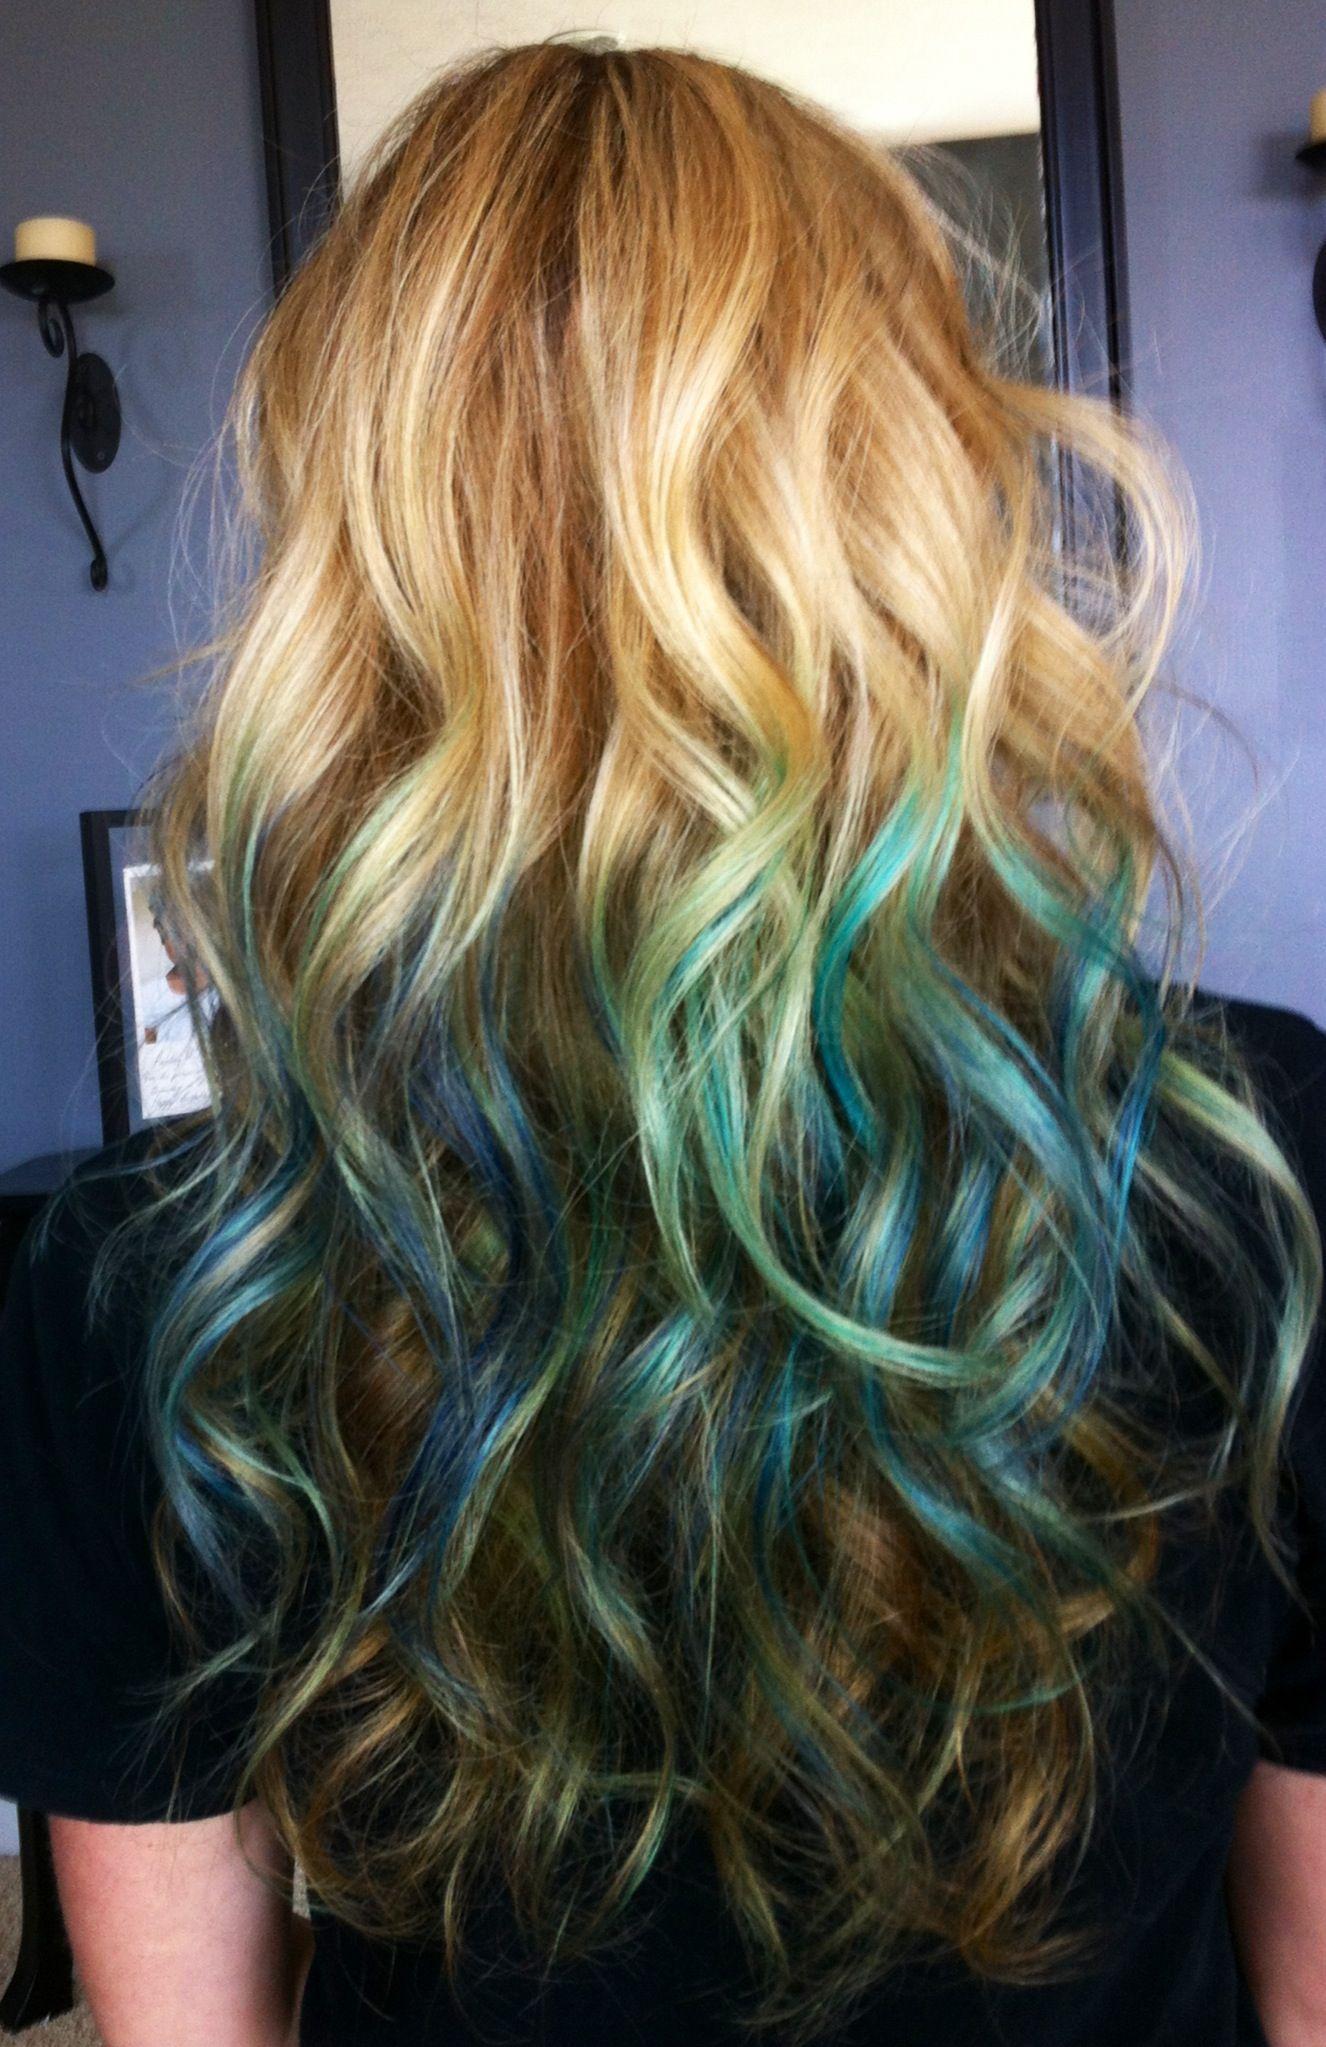 Pin By Nyla Danae On Hair Kool Aid Hair Dye Kool Aid Hair Hair